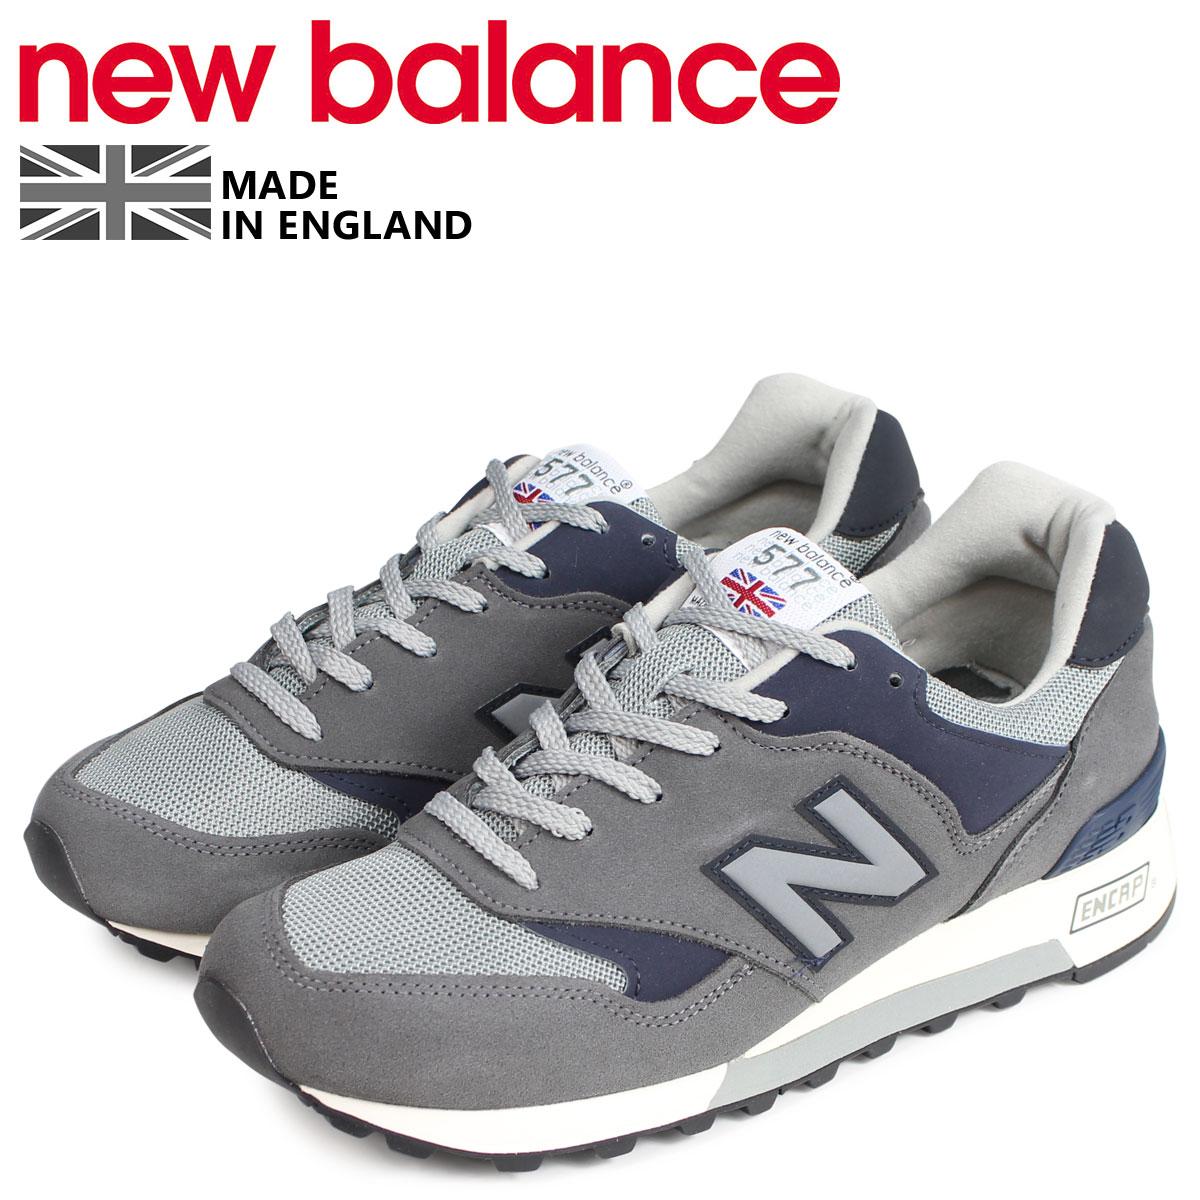 new balance ニューバランス 577 スニーカー メンズ Dワイズ MADE IN UK グレー M577GNA